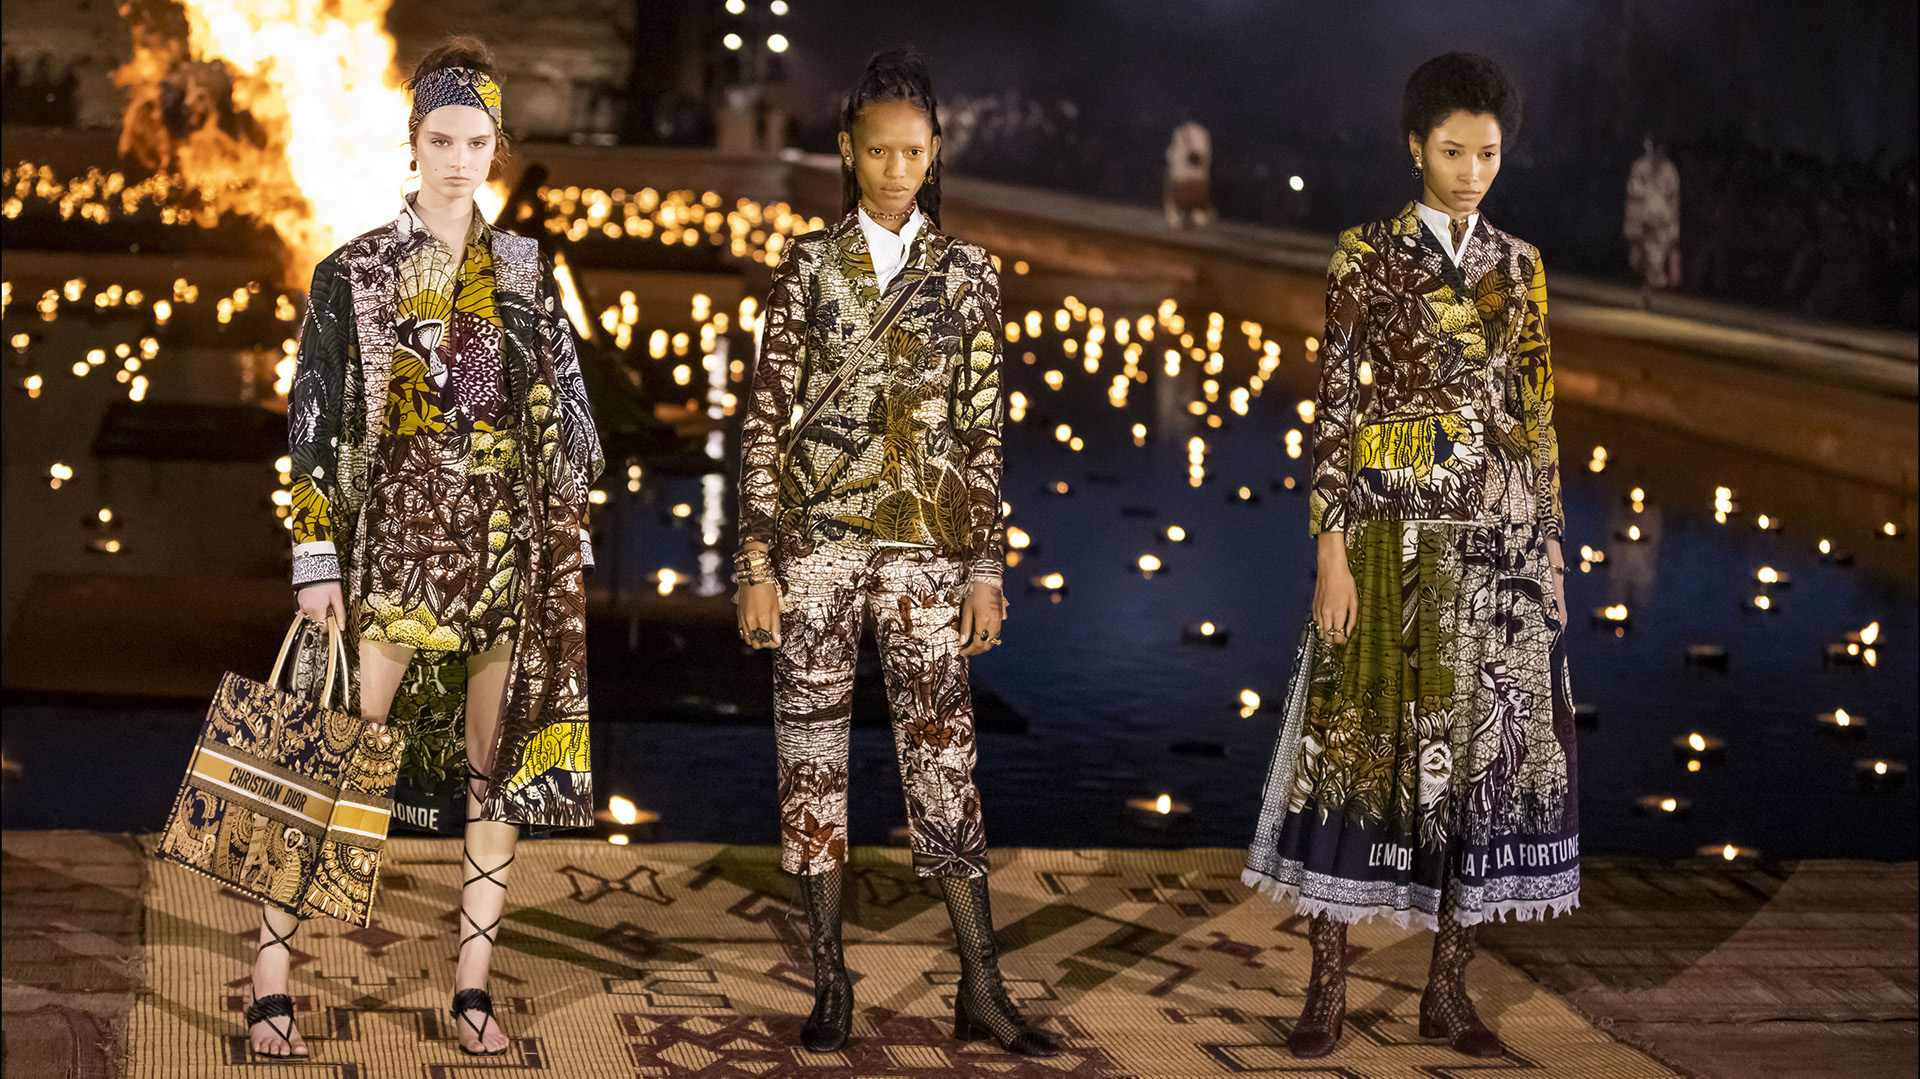 - DÈfilÈ CroisiËre Dior au Palais El Badi ‡ Marrakech, le 29 avril 2019. ---- Catwalk - The Christian Dior Couture Cruise Collection in Marrakech, Morocco, on April 29th, 2019.